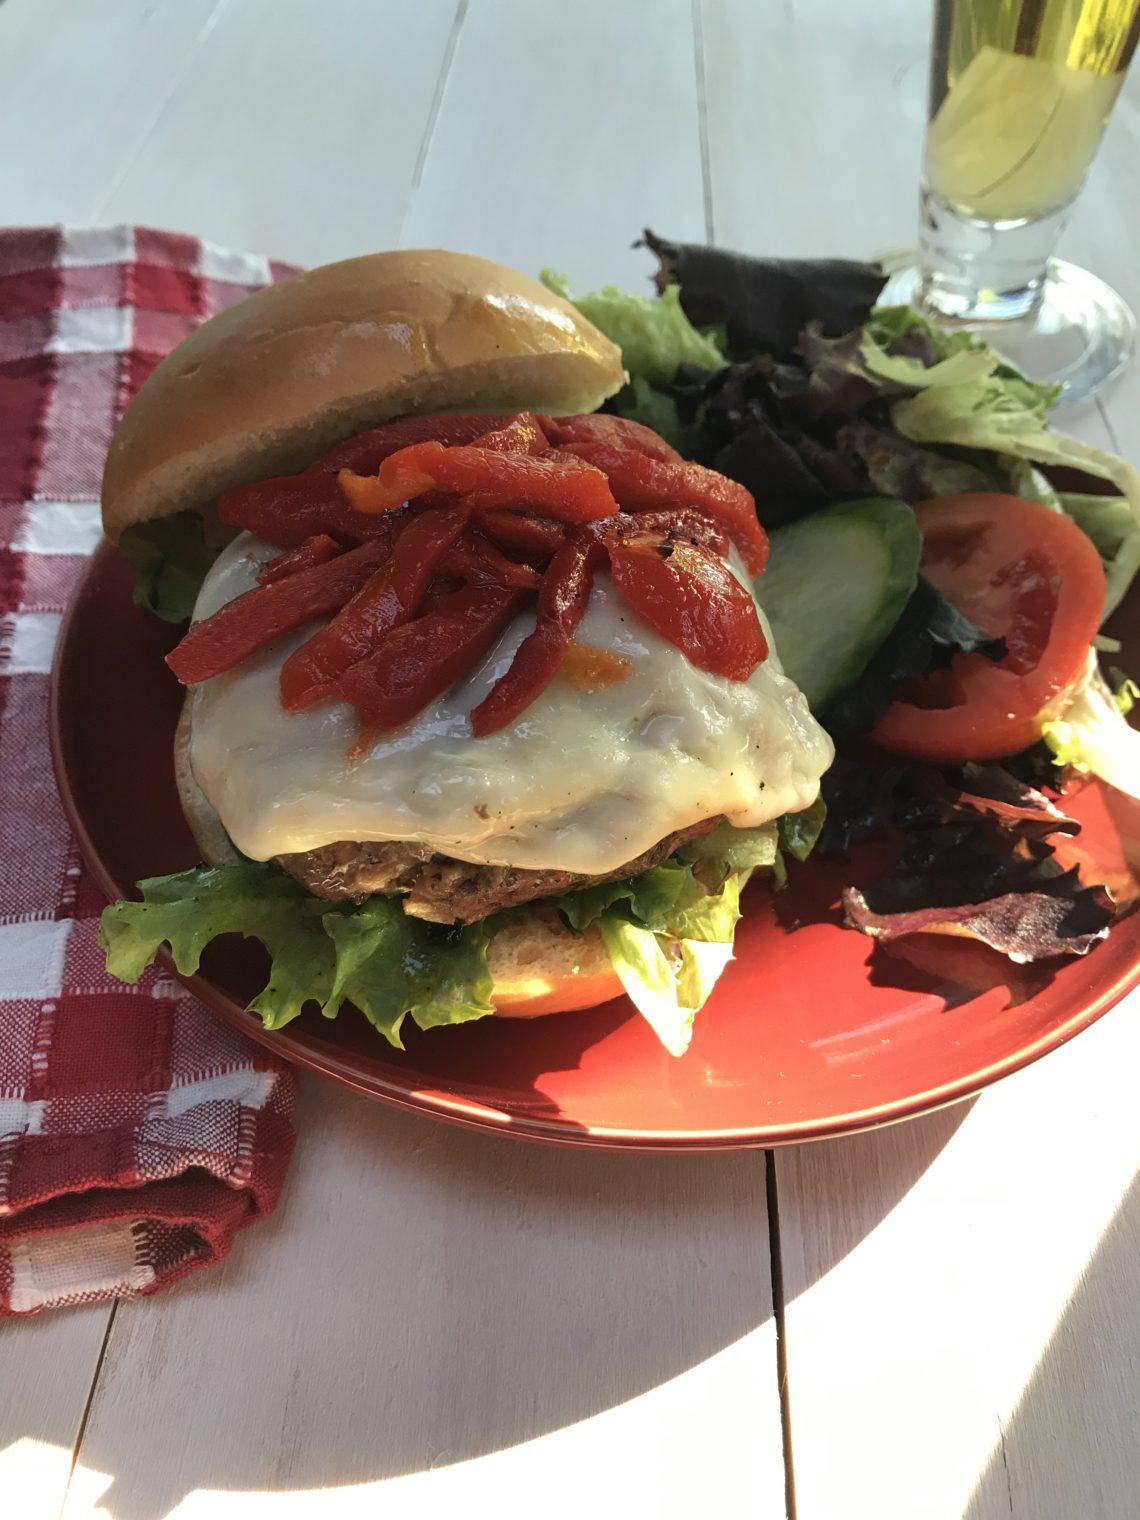 Beef and Mushroom Burger